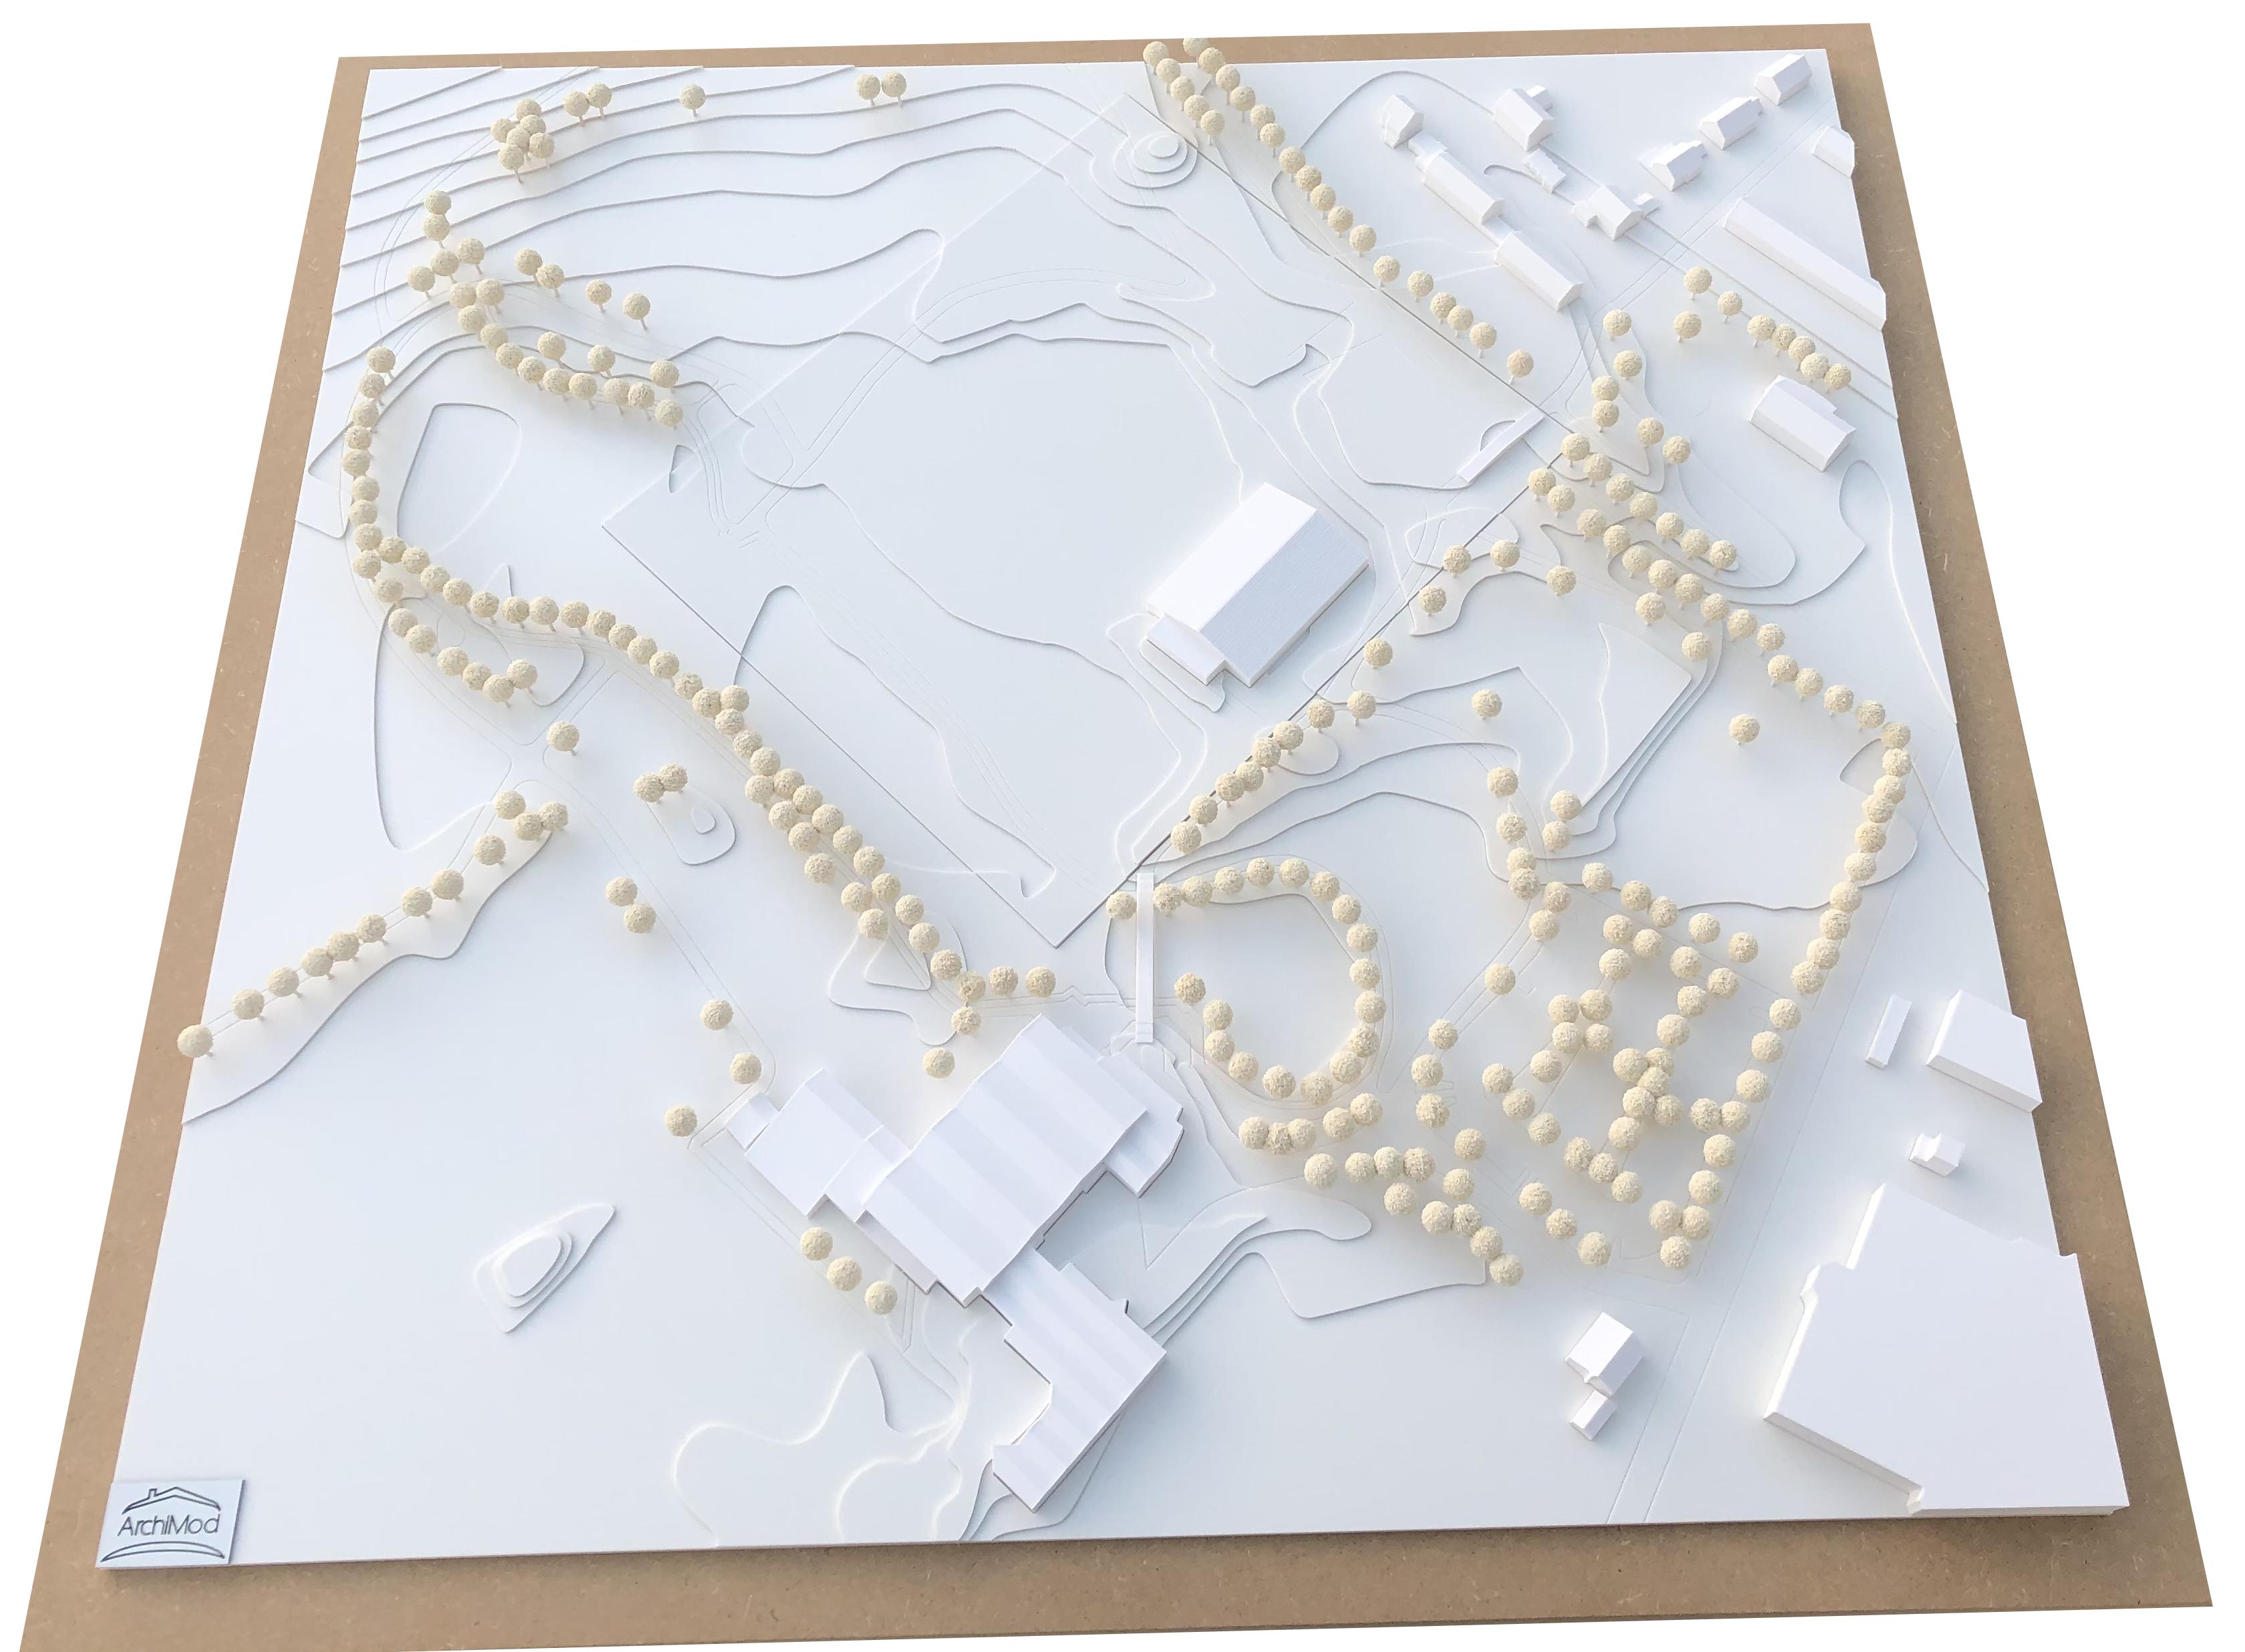 Umgebungsmodell inkl. 21 Einsatzplatten im Maßstab 1:500